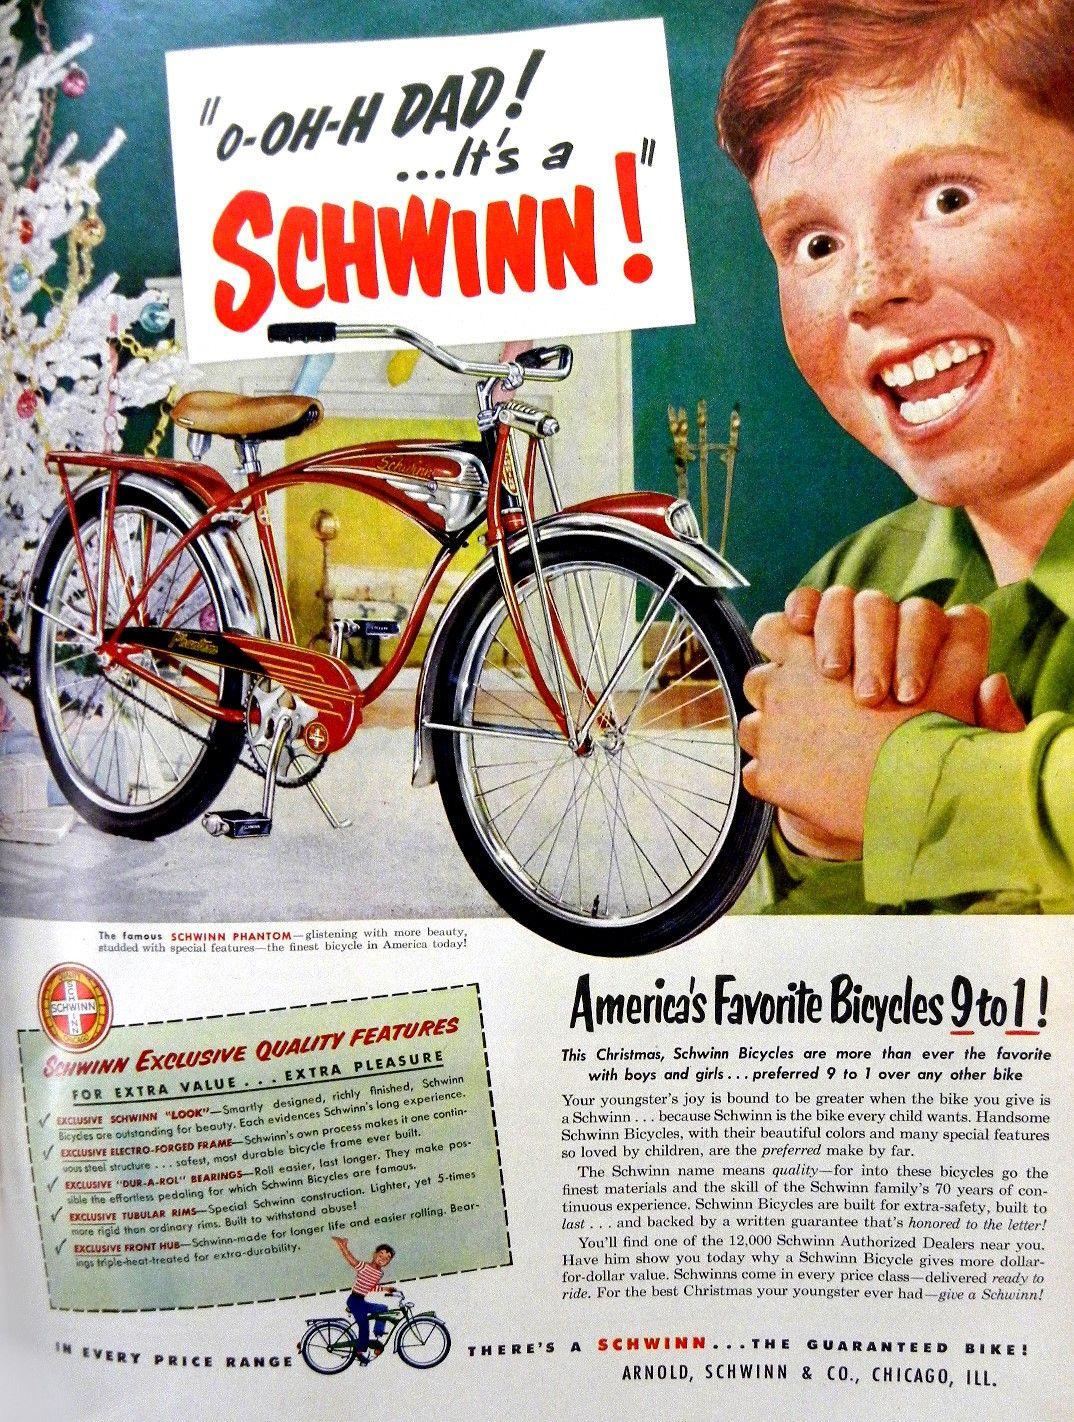 Major freakout for SCHWINN!  Bicycle advertisement. LIFE Magazine, December 3, 1951.